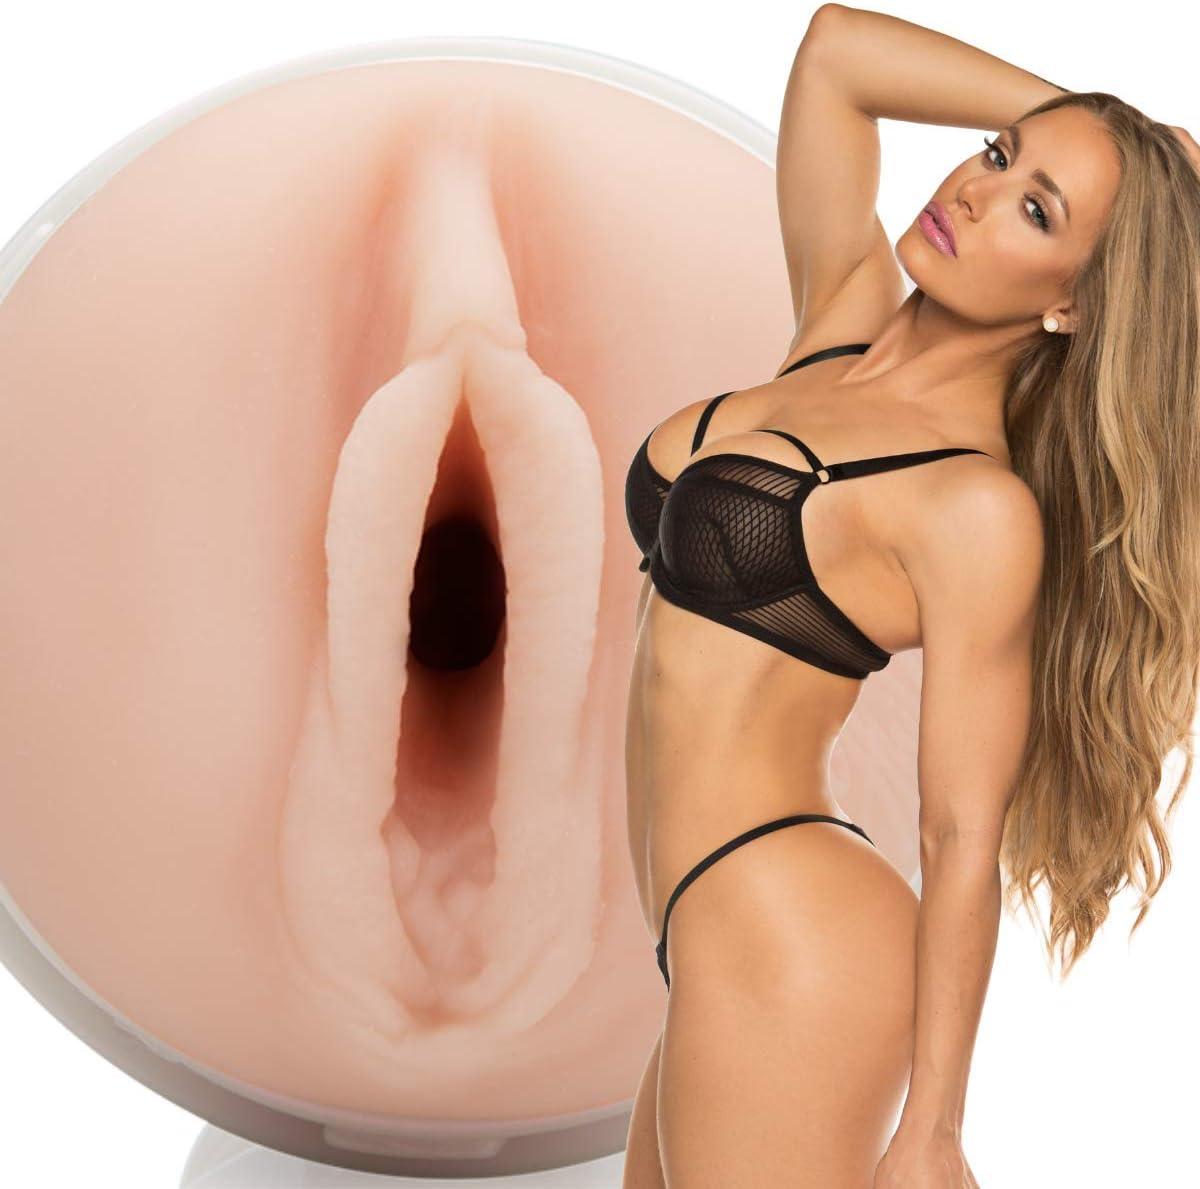 Pussy nicole aniston Nicole Aniston